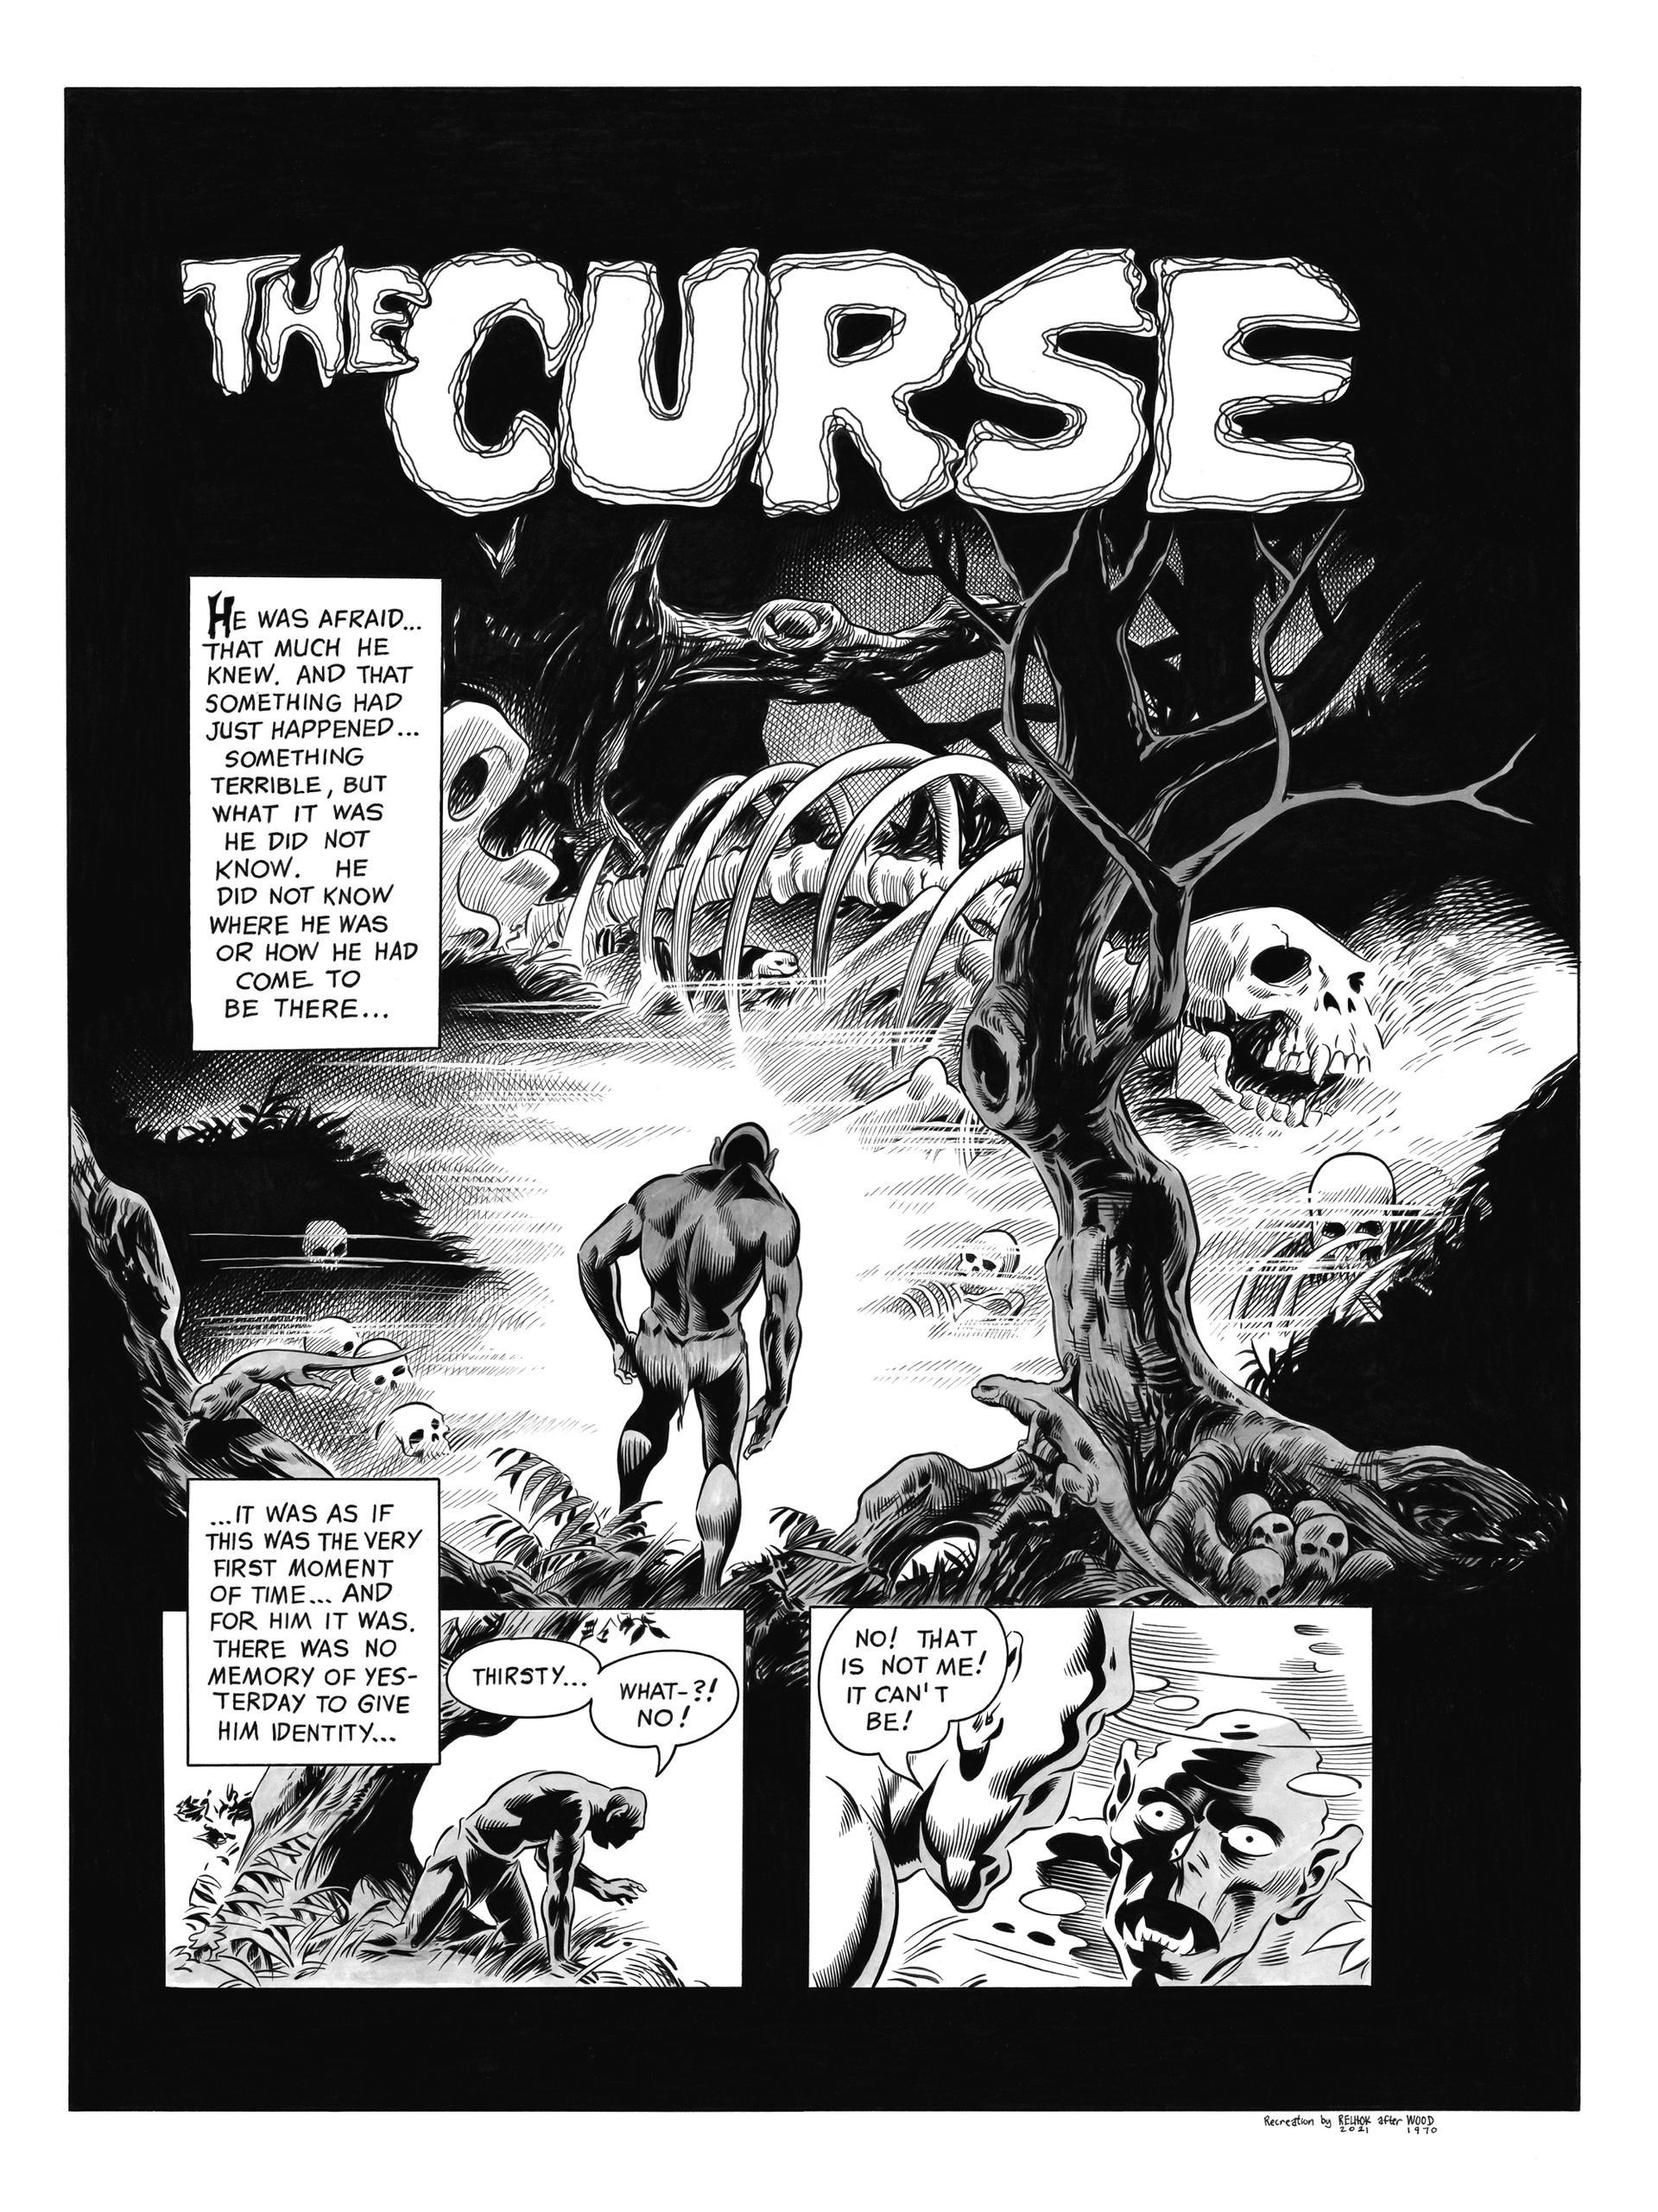 Wally Wood - Curse page 1 recreation, Vampirella 9